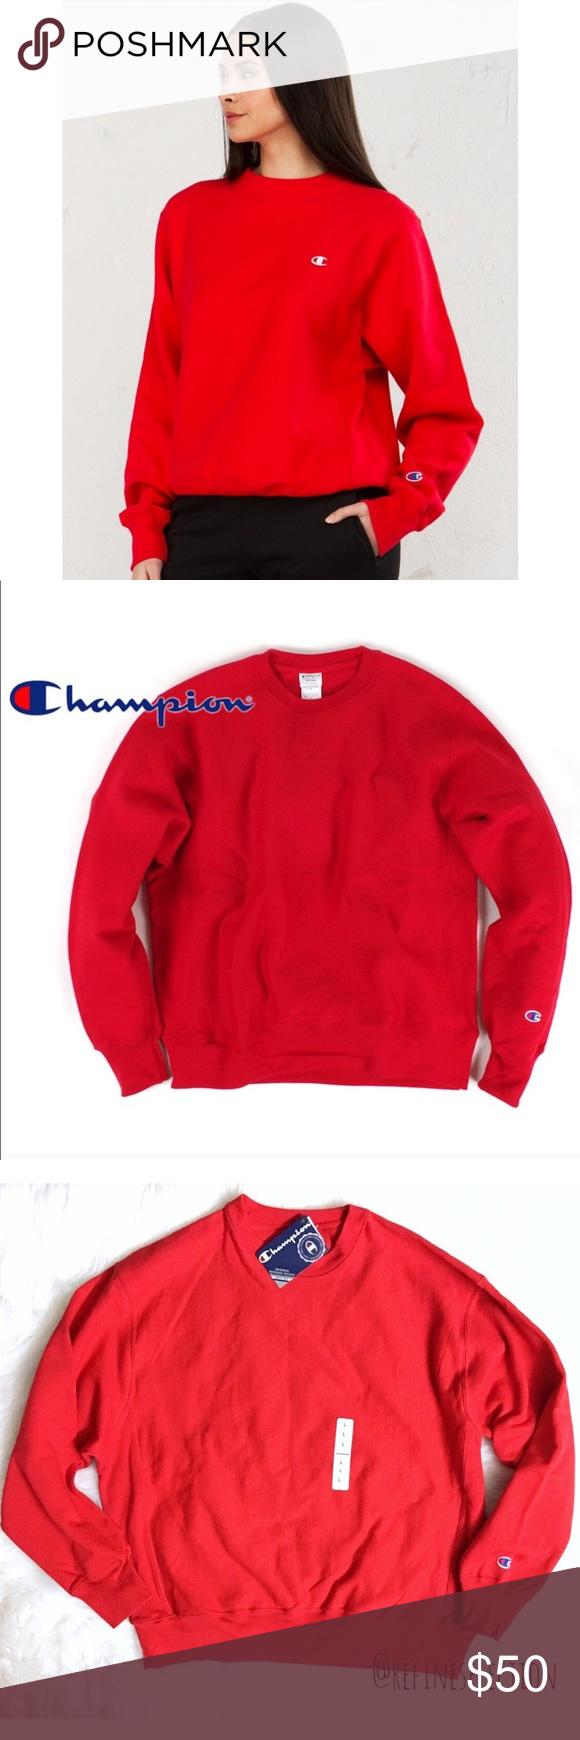 Champion Reverse Weave Red Crewneck Sweatshirt Red Crewneck Sweatshirts Champion Reverse Weave [ 1740 x 580 Pixel ]